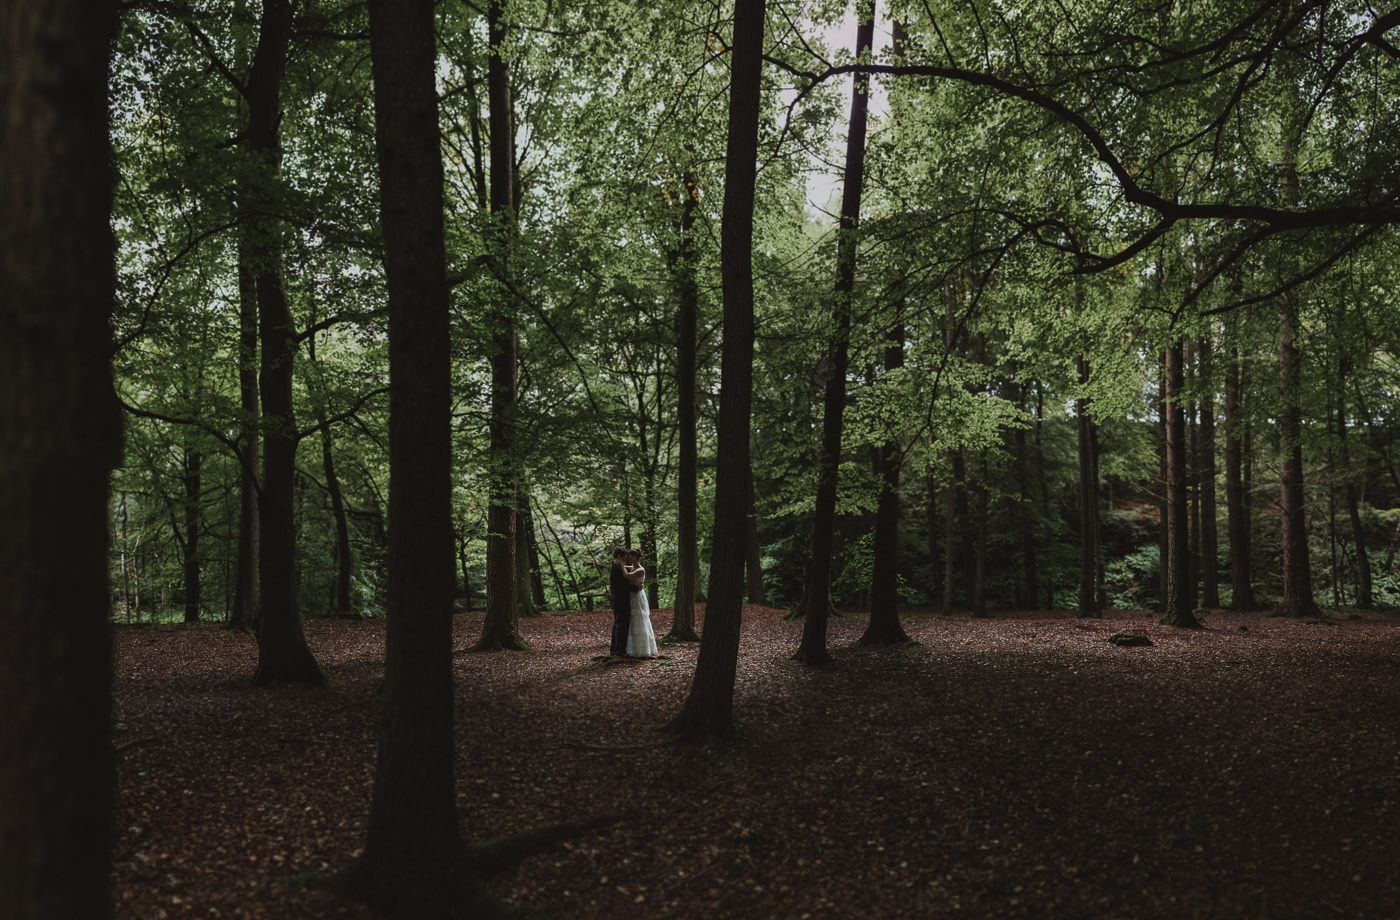 Wedding couple embracing in the autumn woodland by Joshua Wyborn Photographic